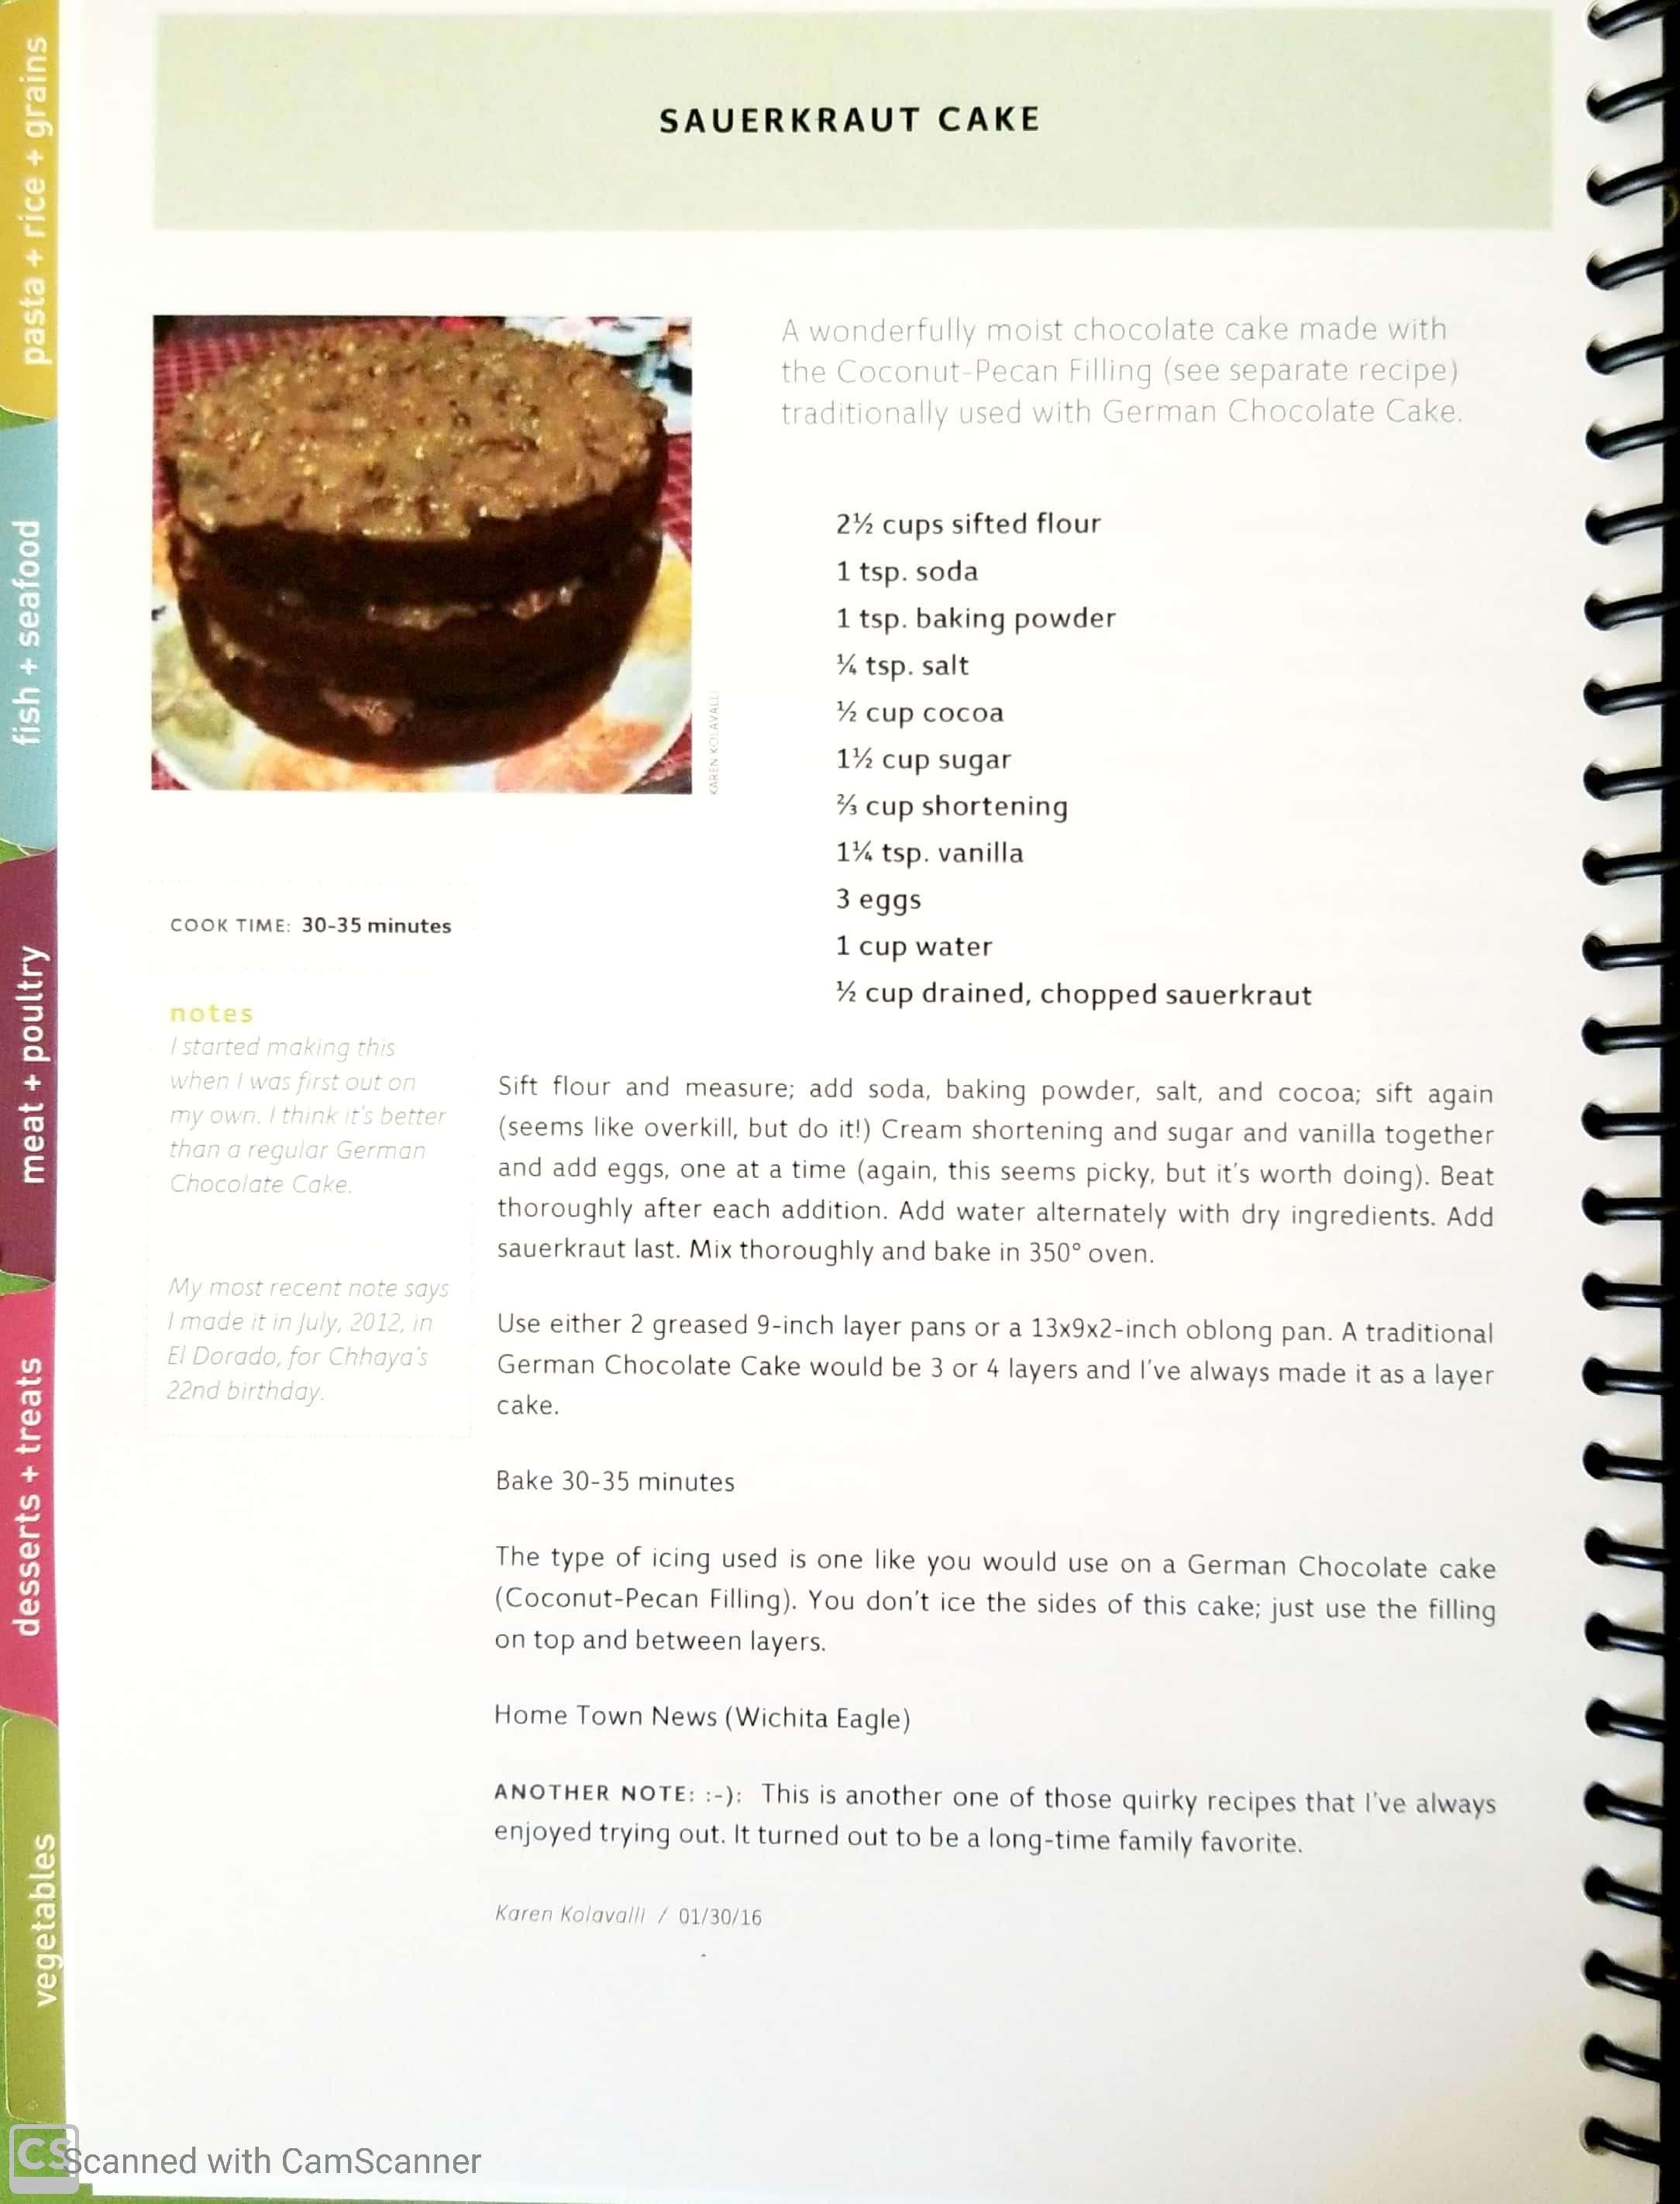 sauerkraut cake in KK cookbook